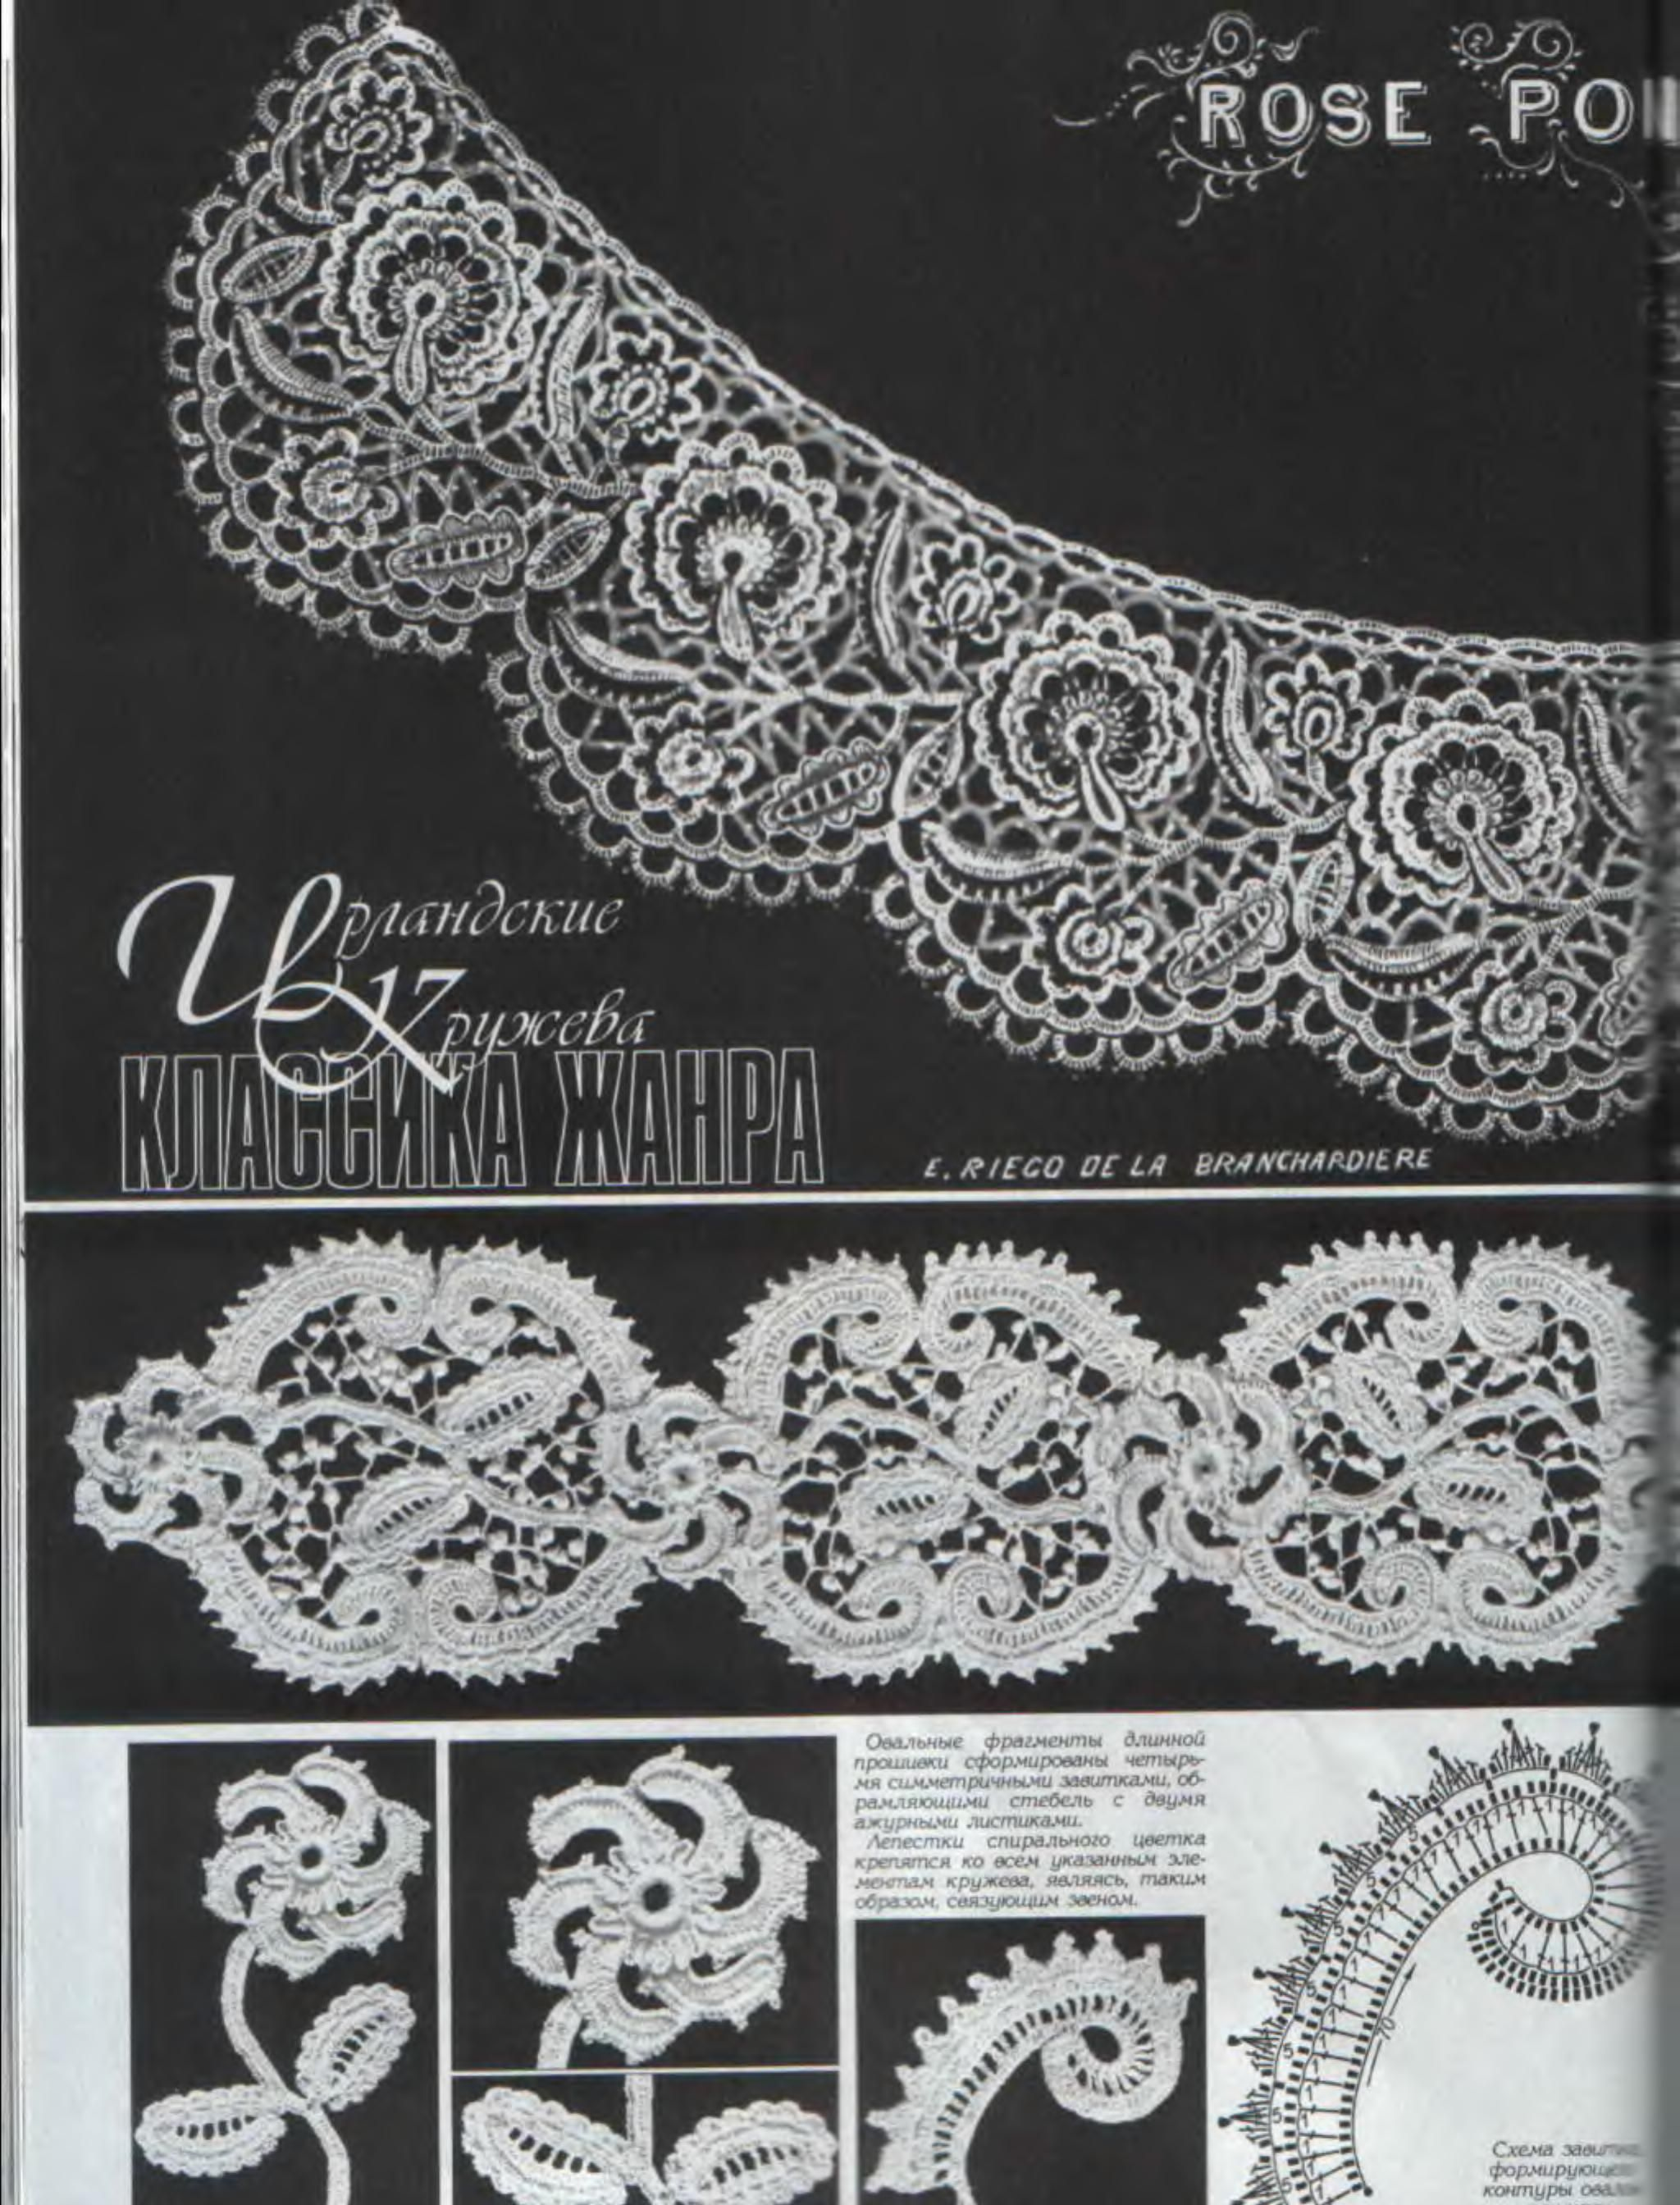 Imgbox fast simple image host duplet ayudet crochet galore crochet bankloansurffo Gallery